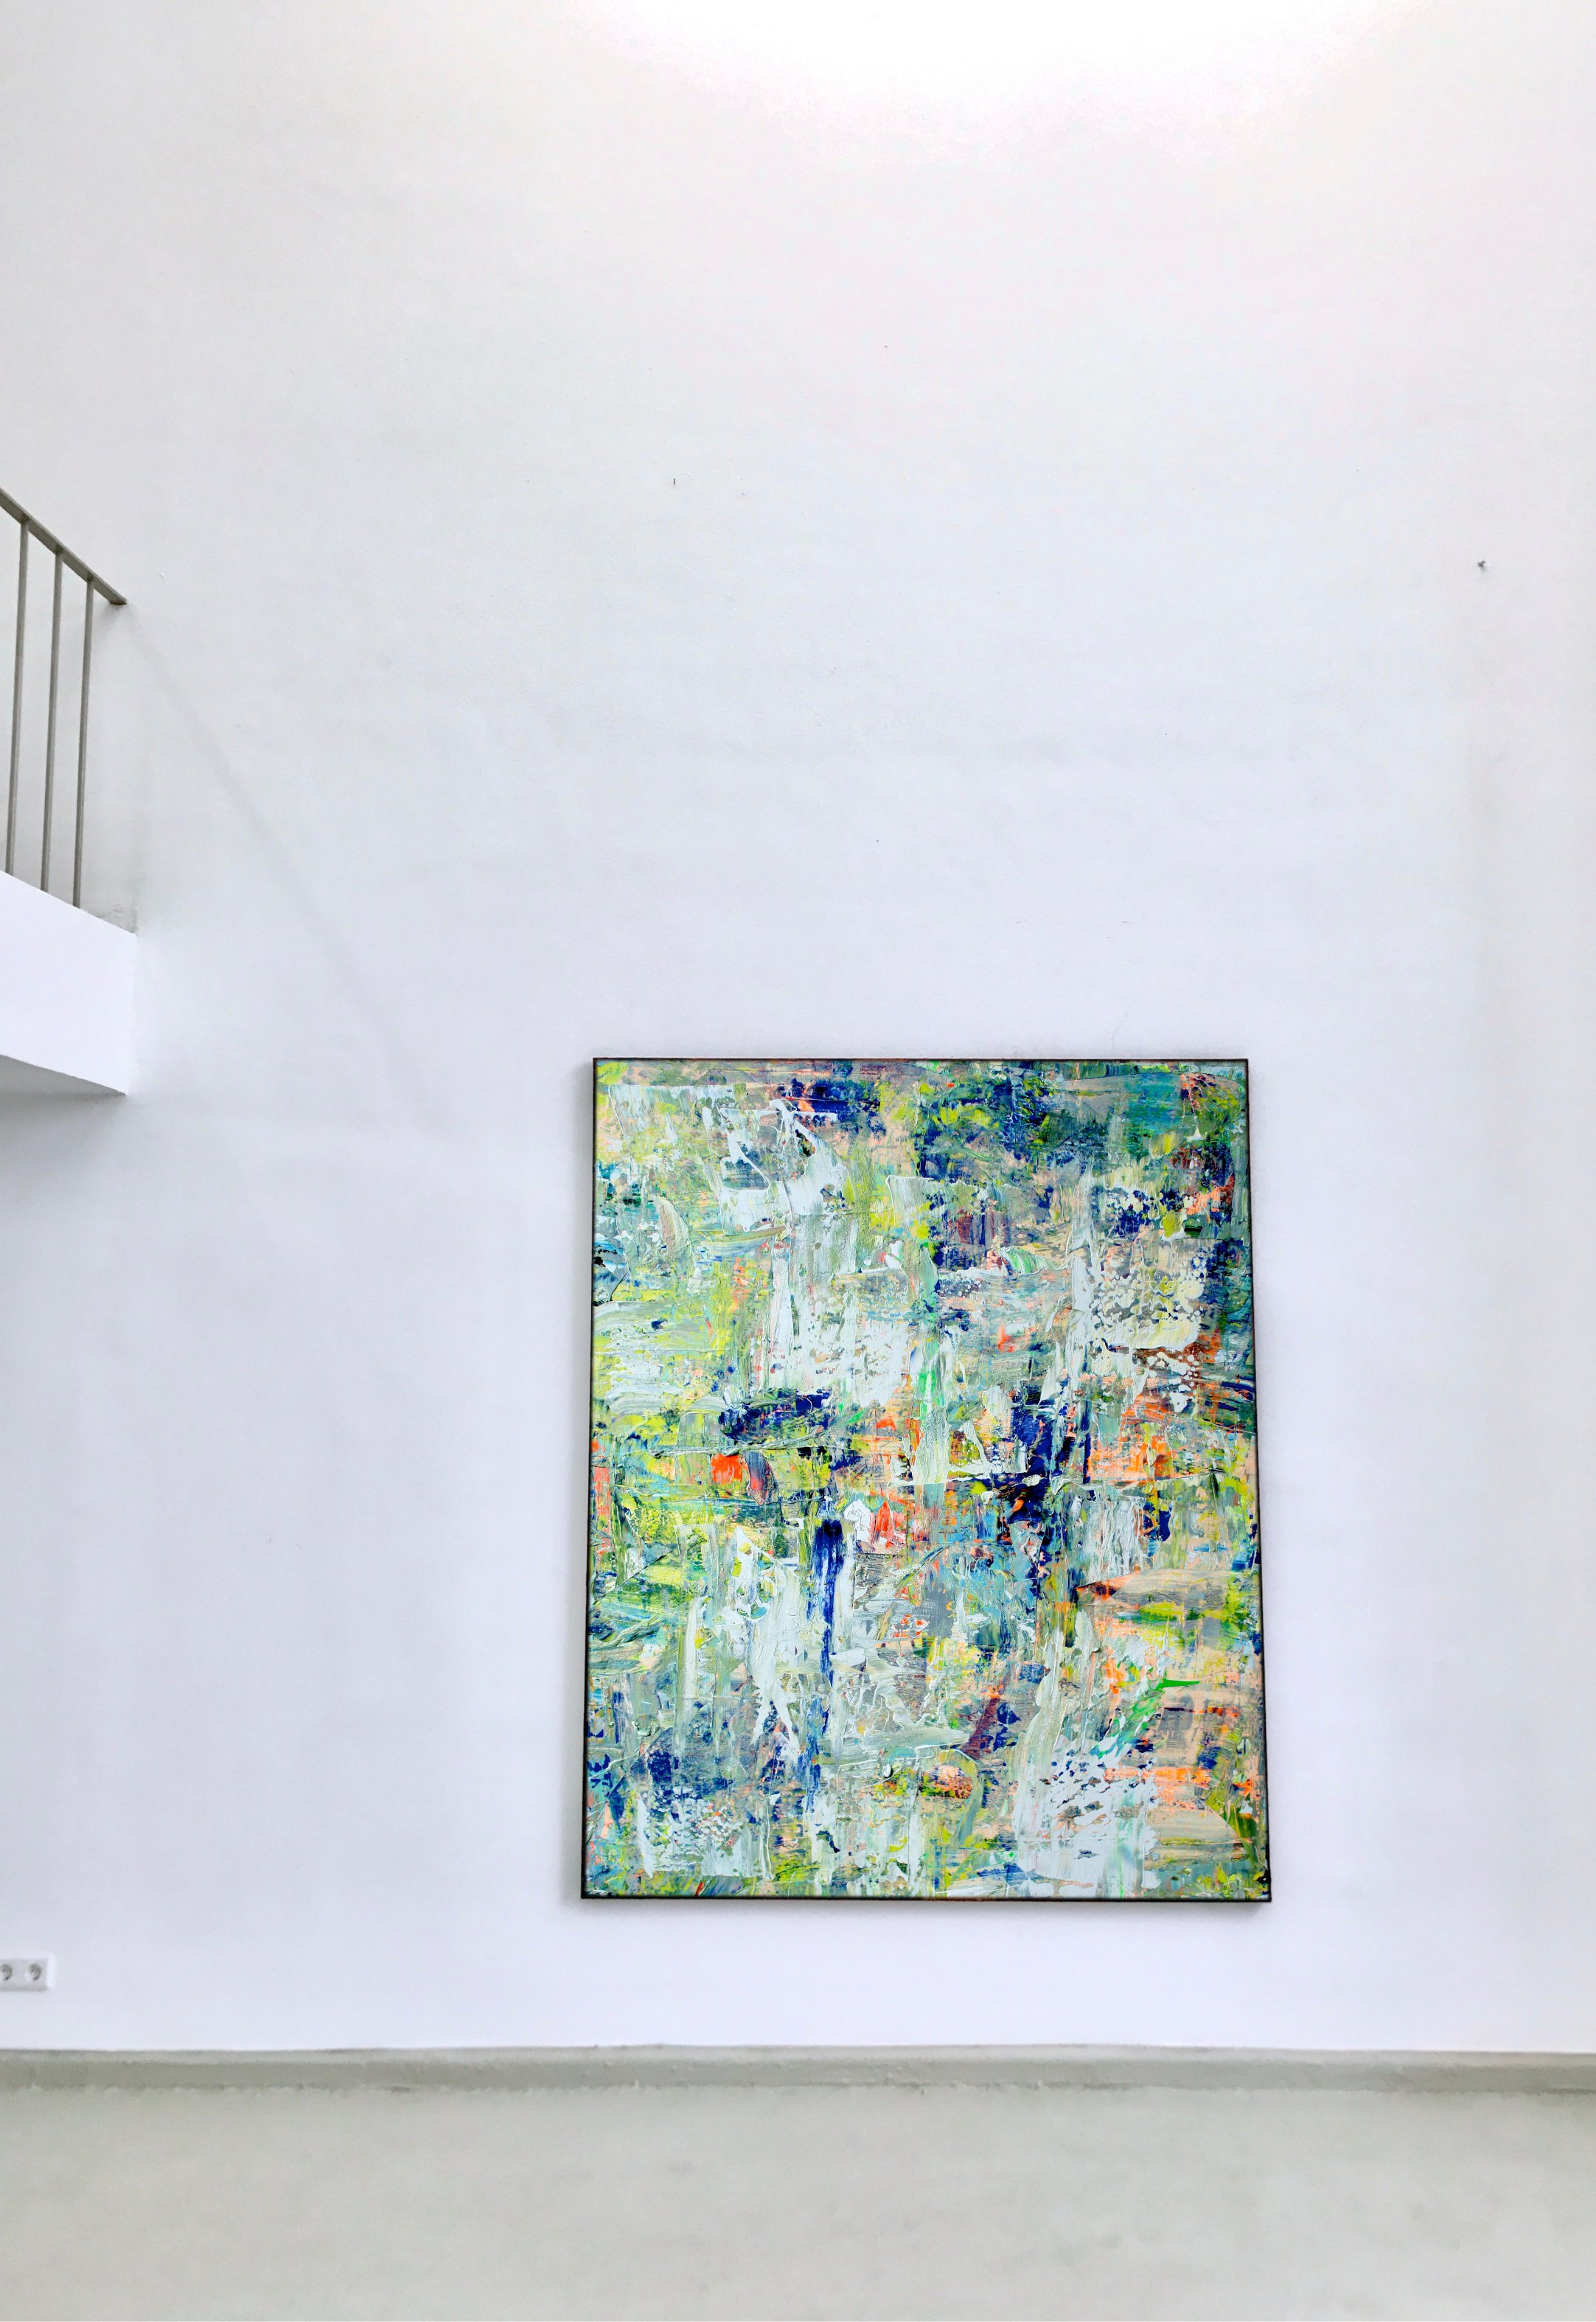 Abstraktes Bild Kunst Artist Ausstellung THERESA KALLRATH BEAUX ART PARIS KUNSTAKADEMIE DÜSSELDORF ARTIST ABSTRAKT RUNDGANG 2018 Painting WALL